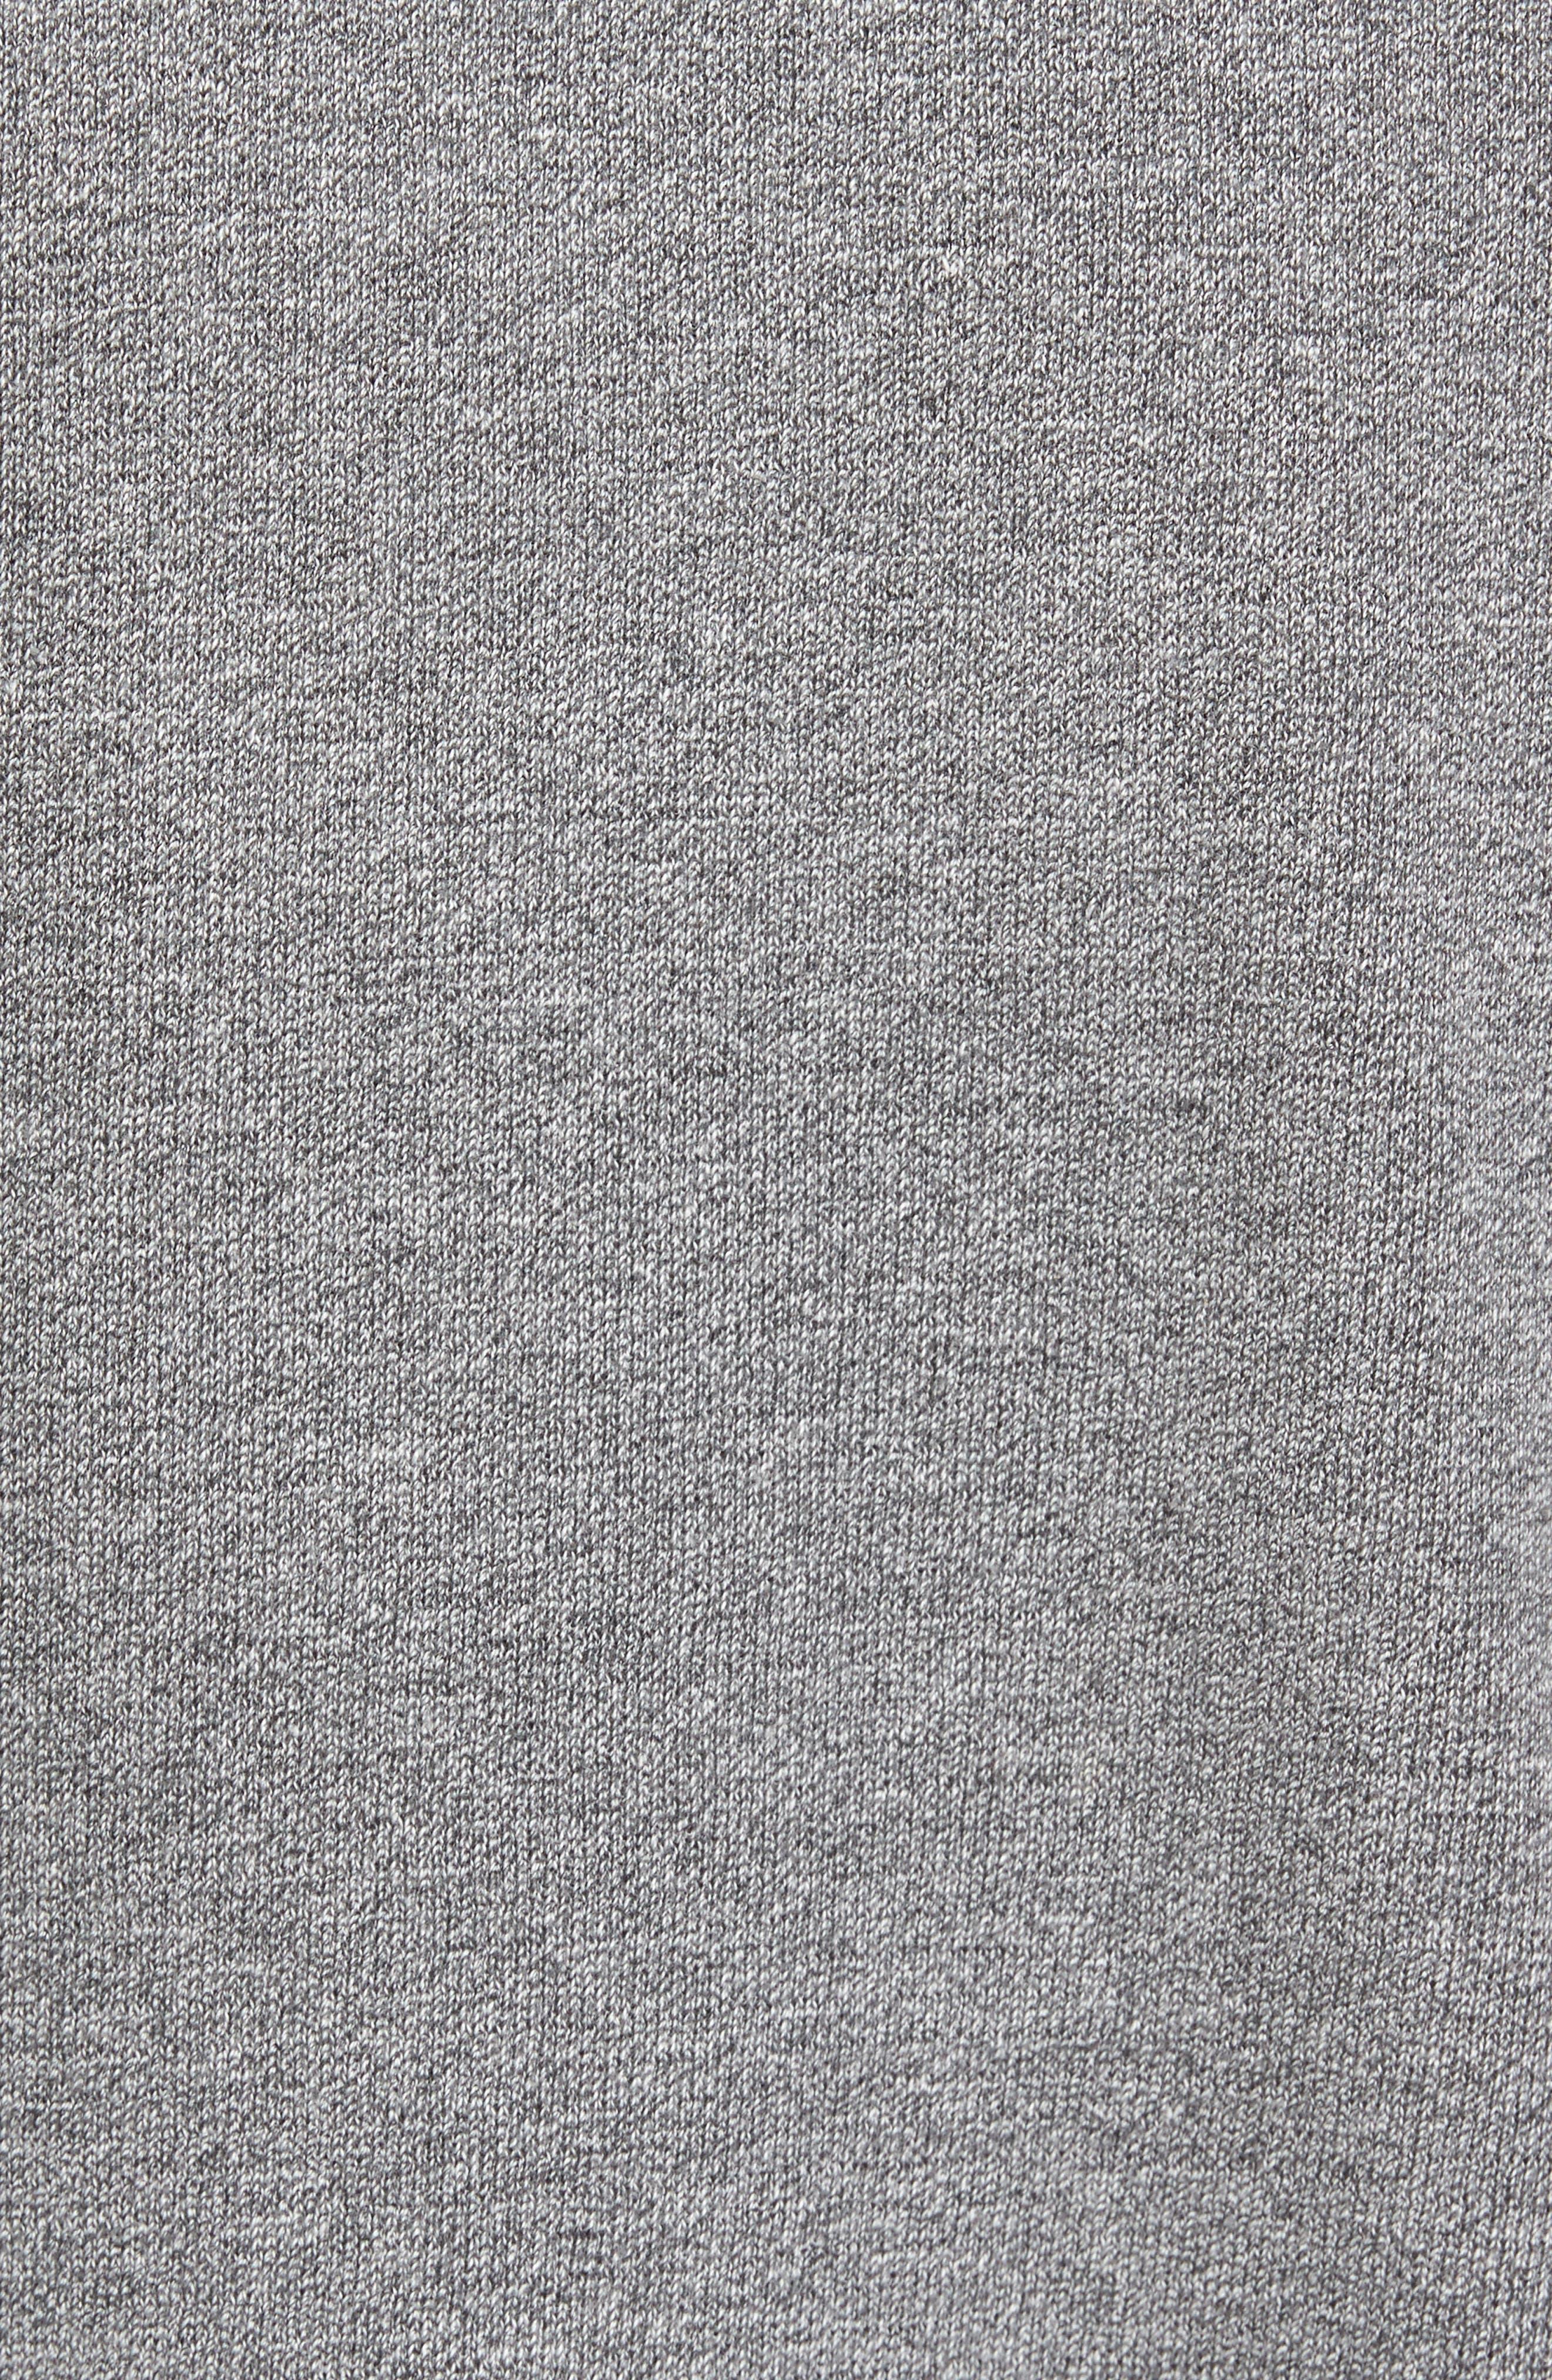 NFL Stitch of Liberty Embroidered Crewneck Sweatshirt,                             Alternate thumbnail 130, color,